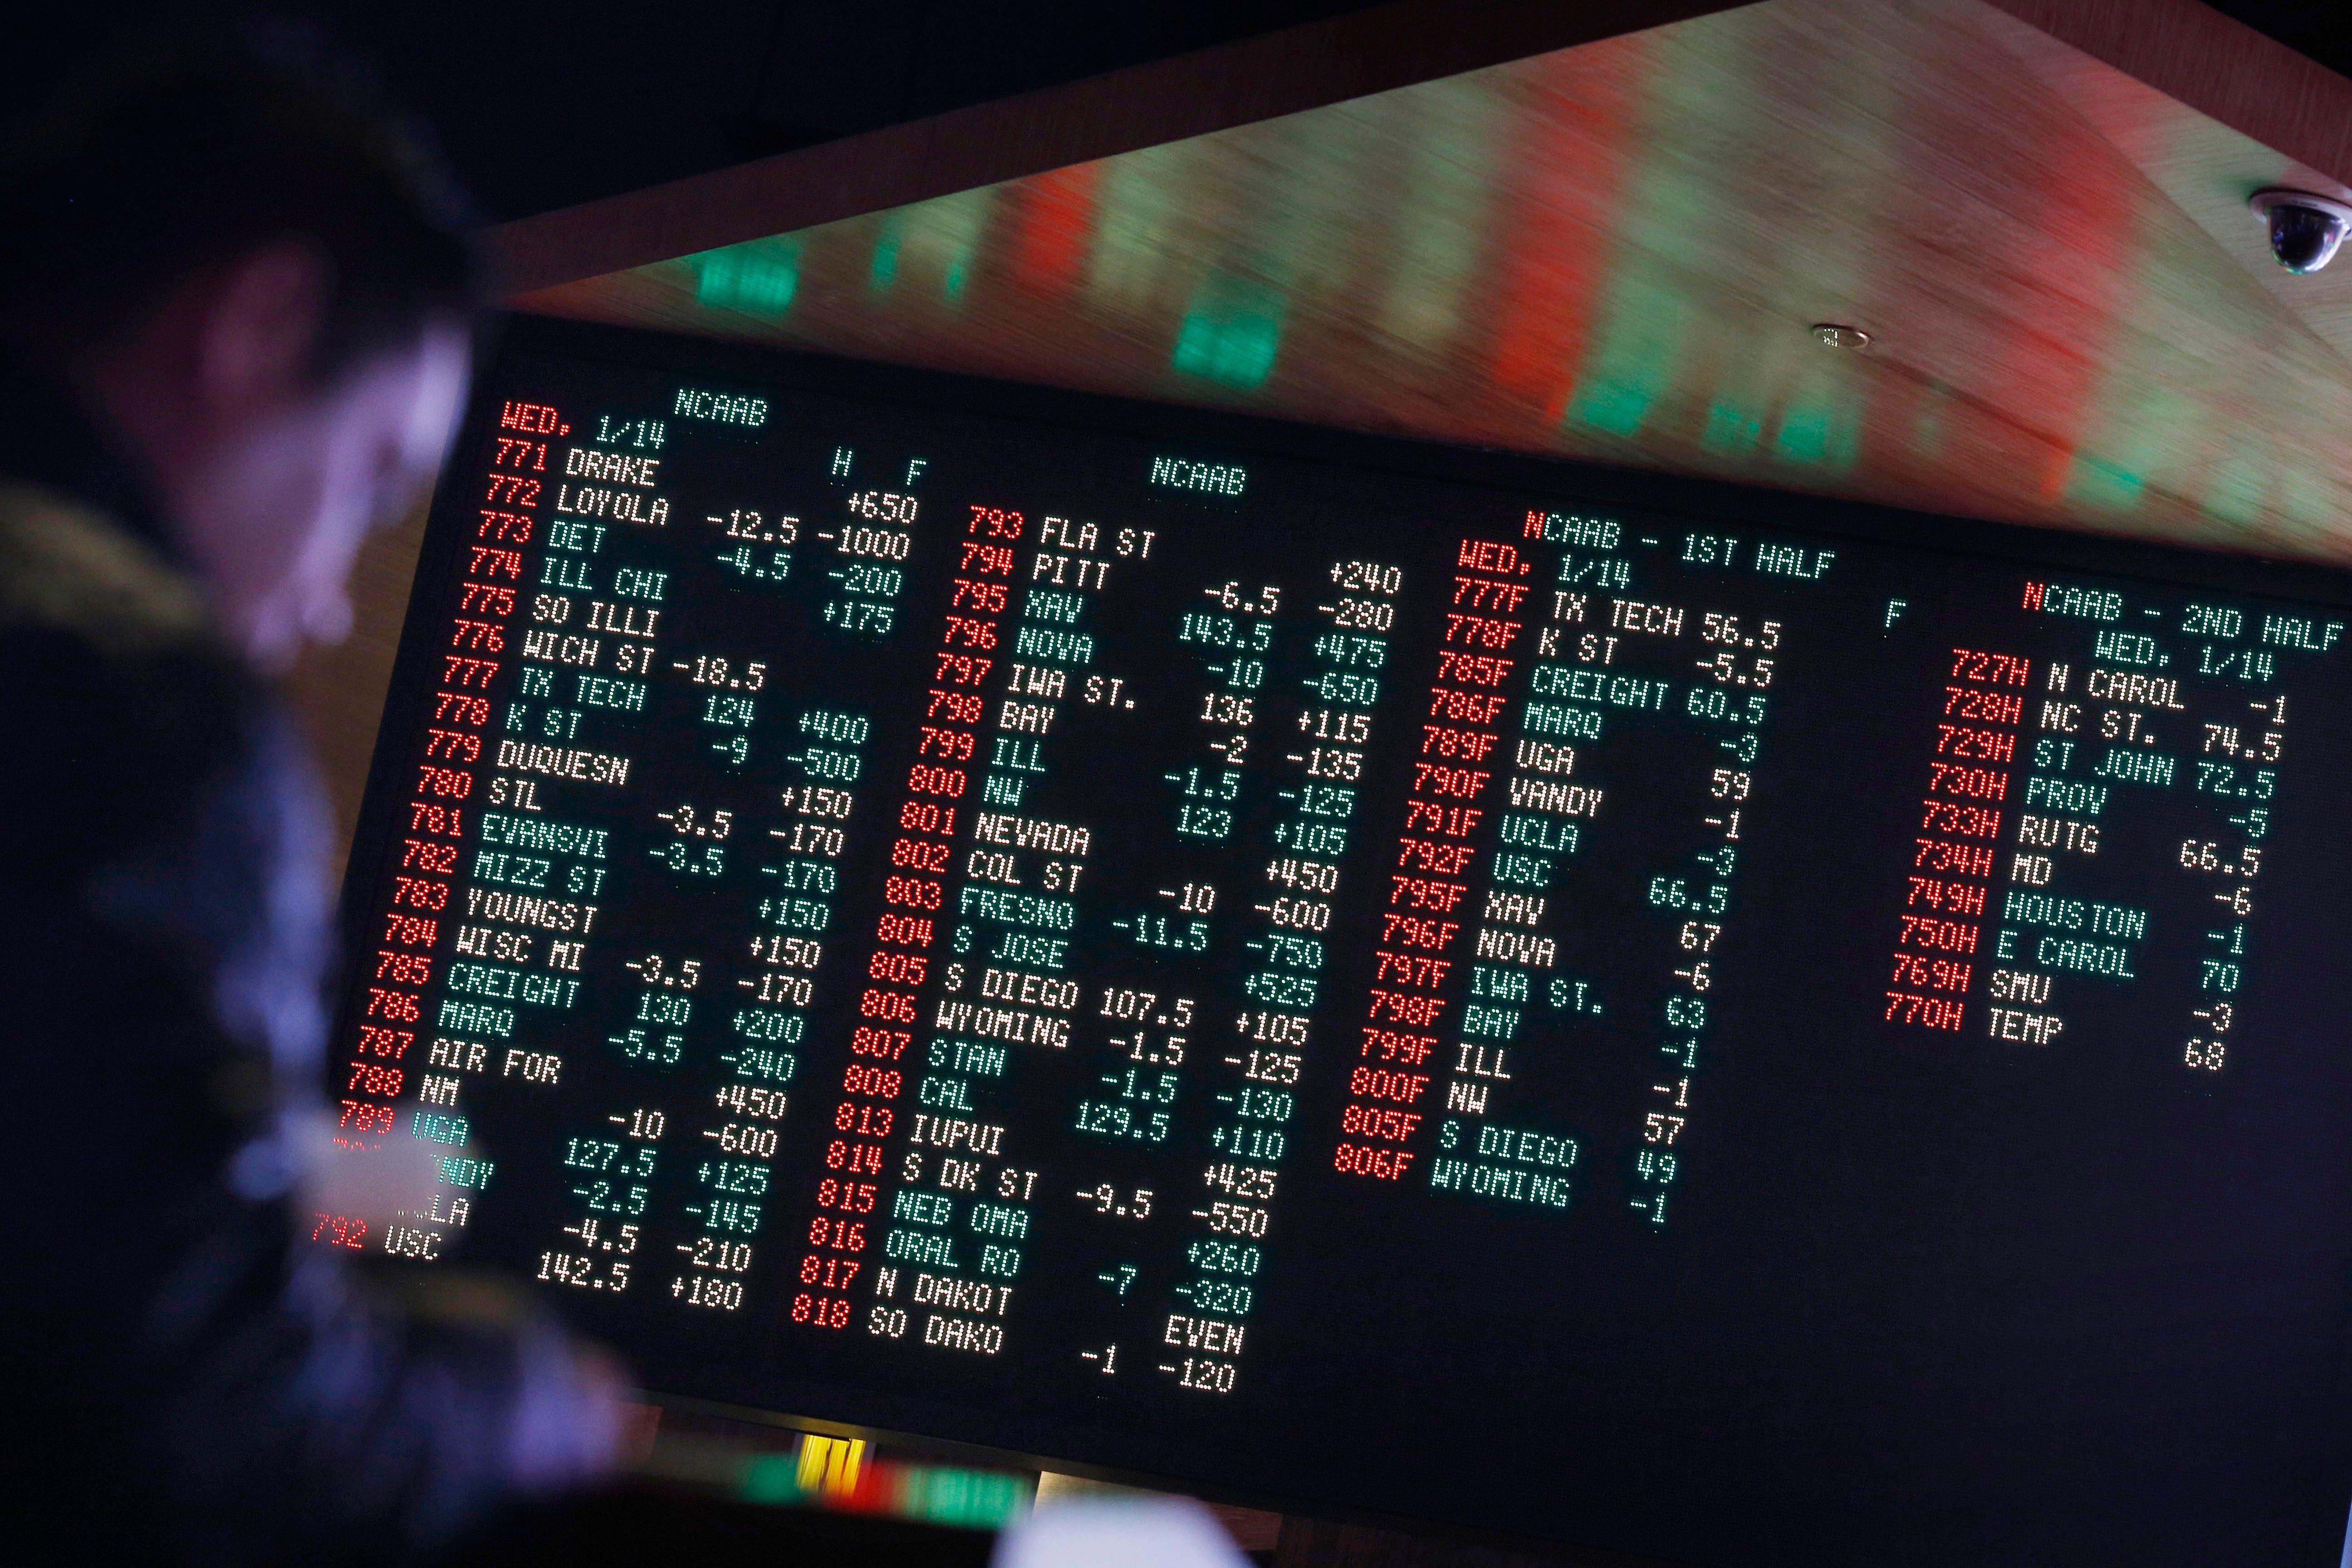 Ohio gambling bill procter and gamble videos